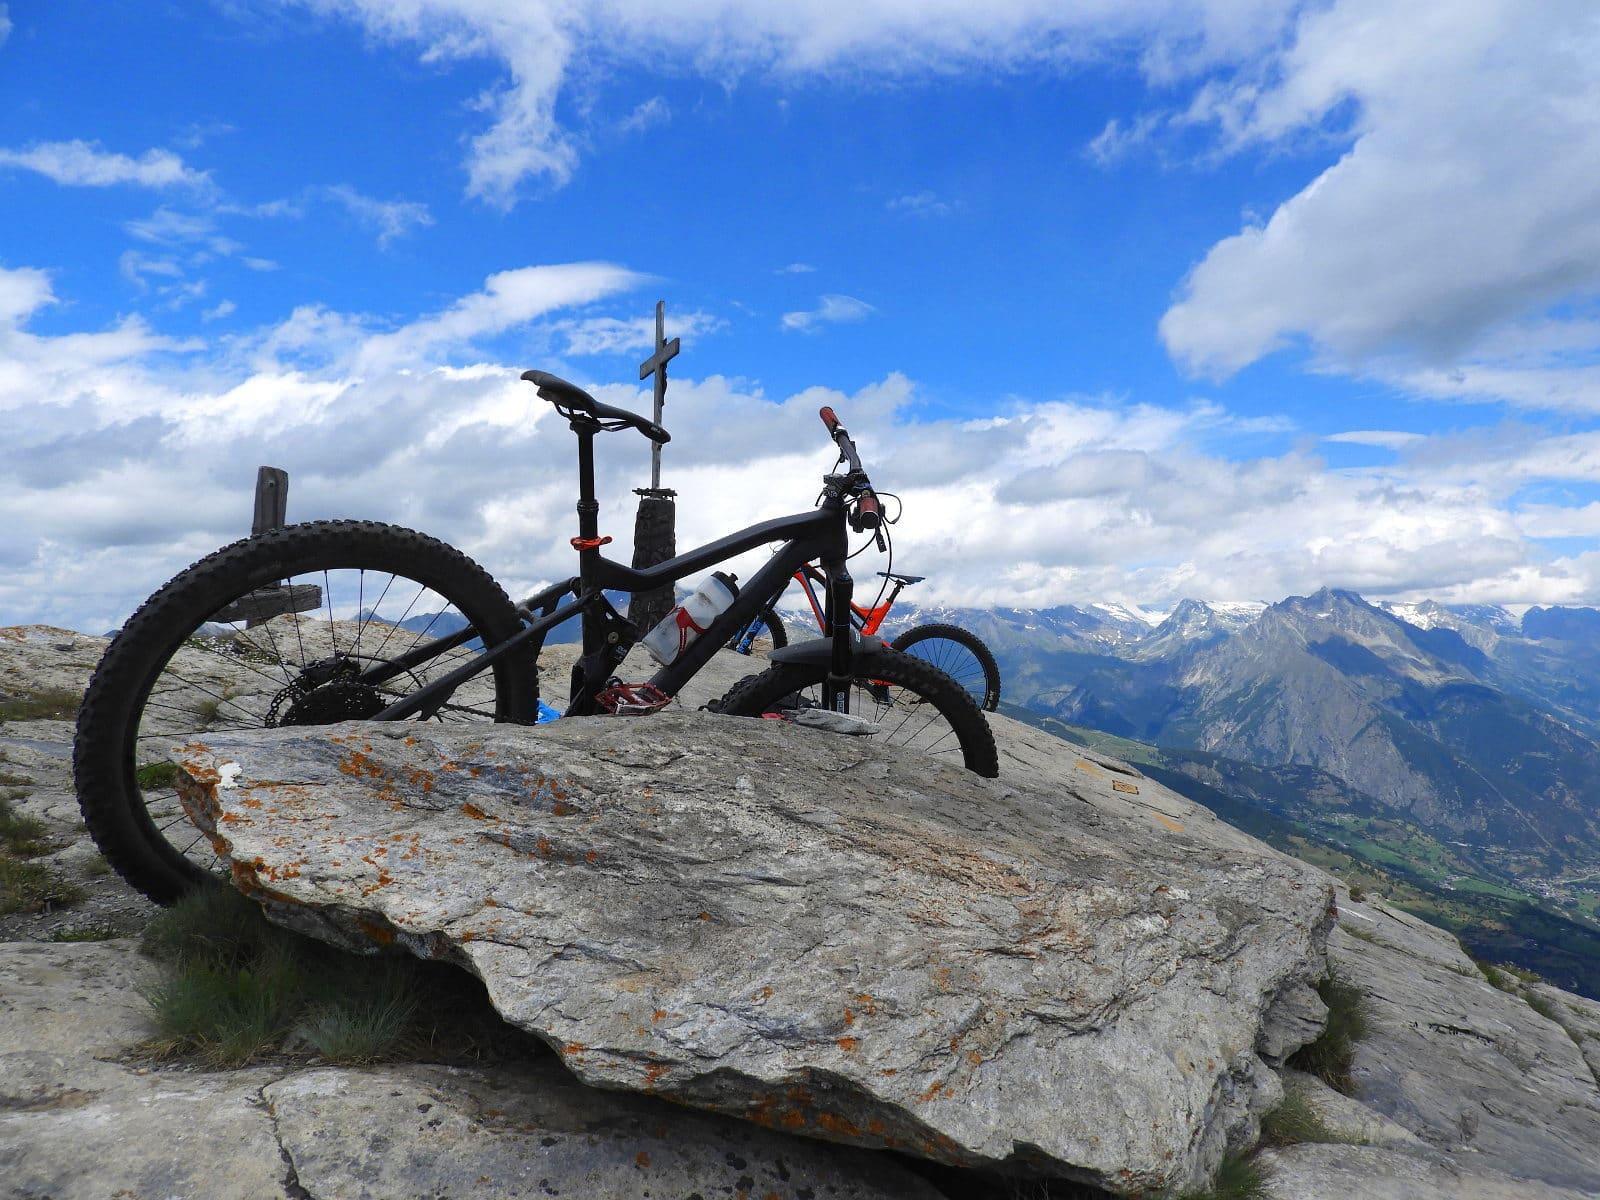 Gipfelglück mit dem Mountainbike